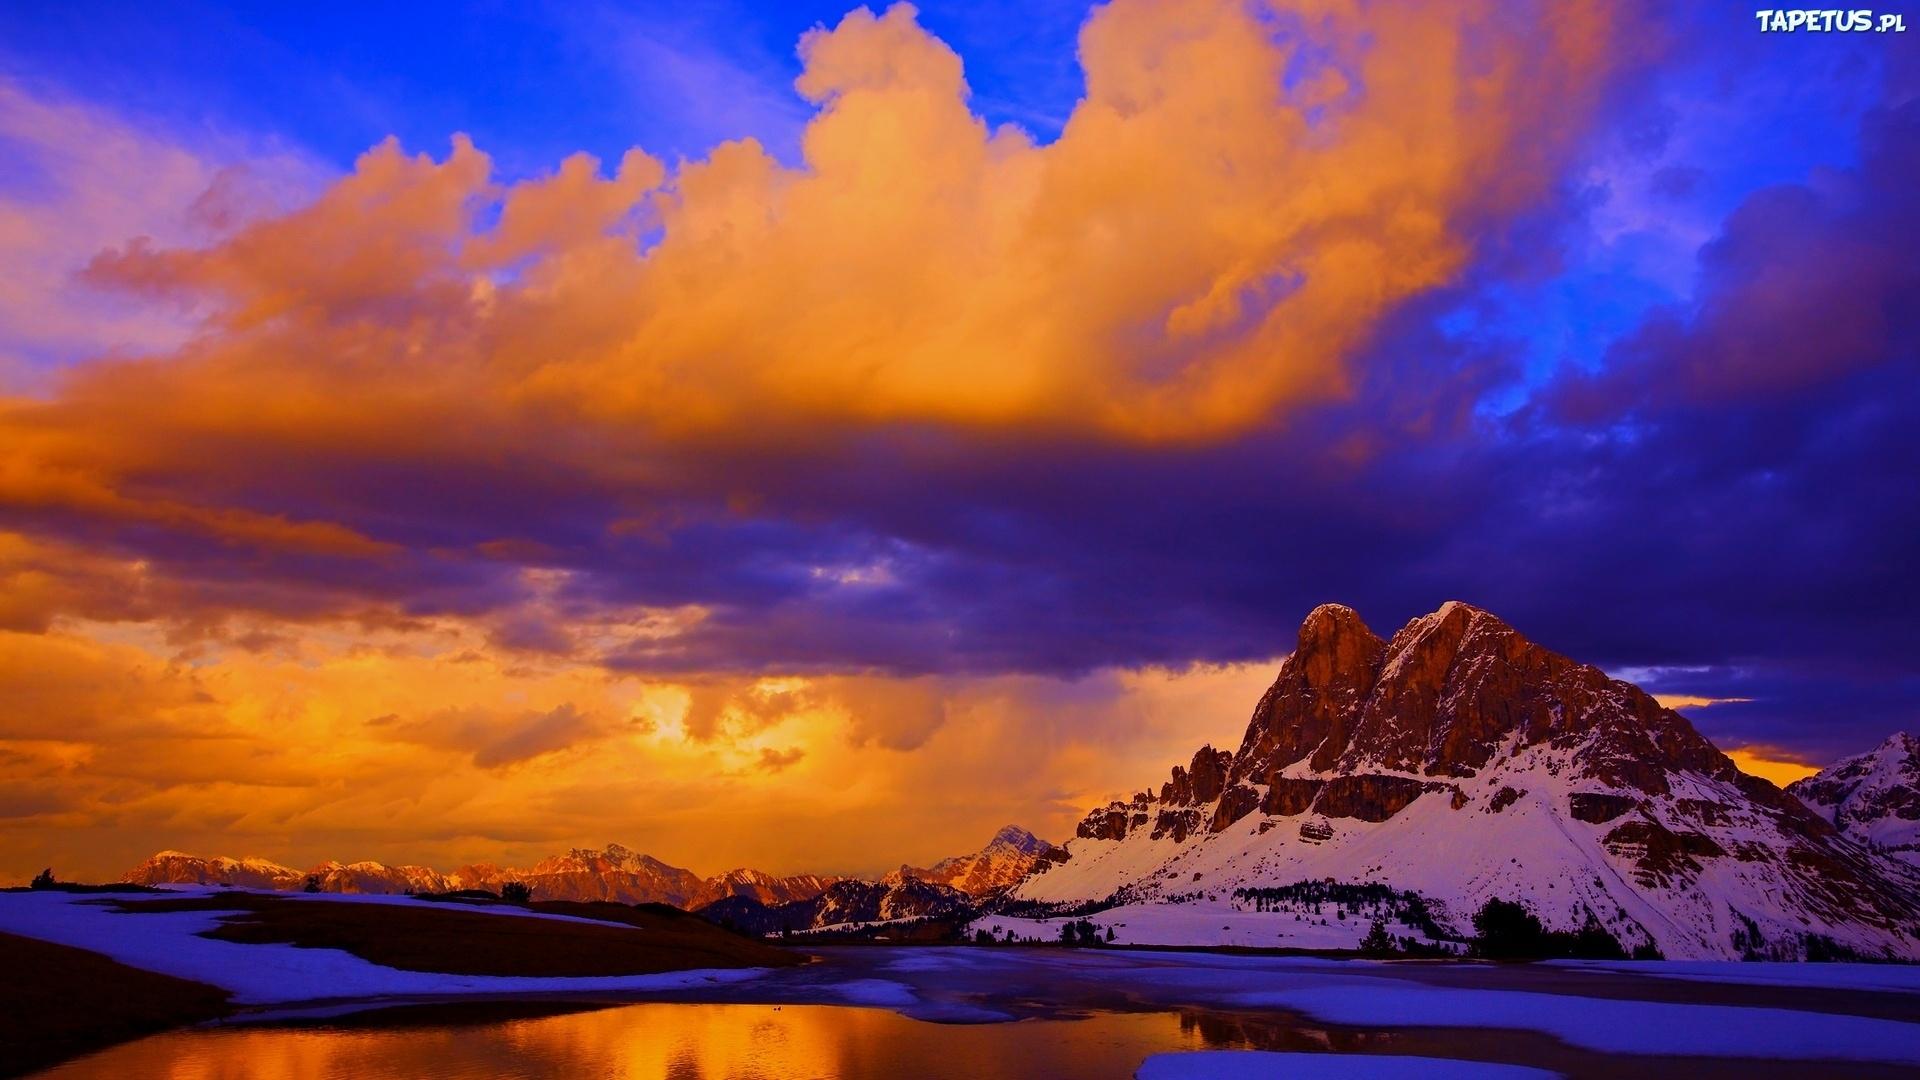 закат горы небо вода  № 1019620 бесплатно